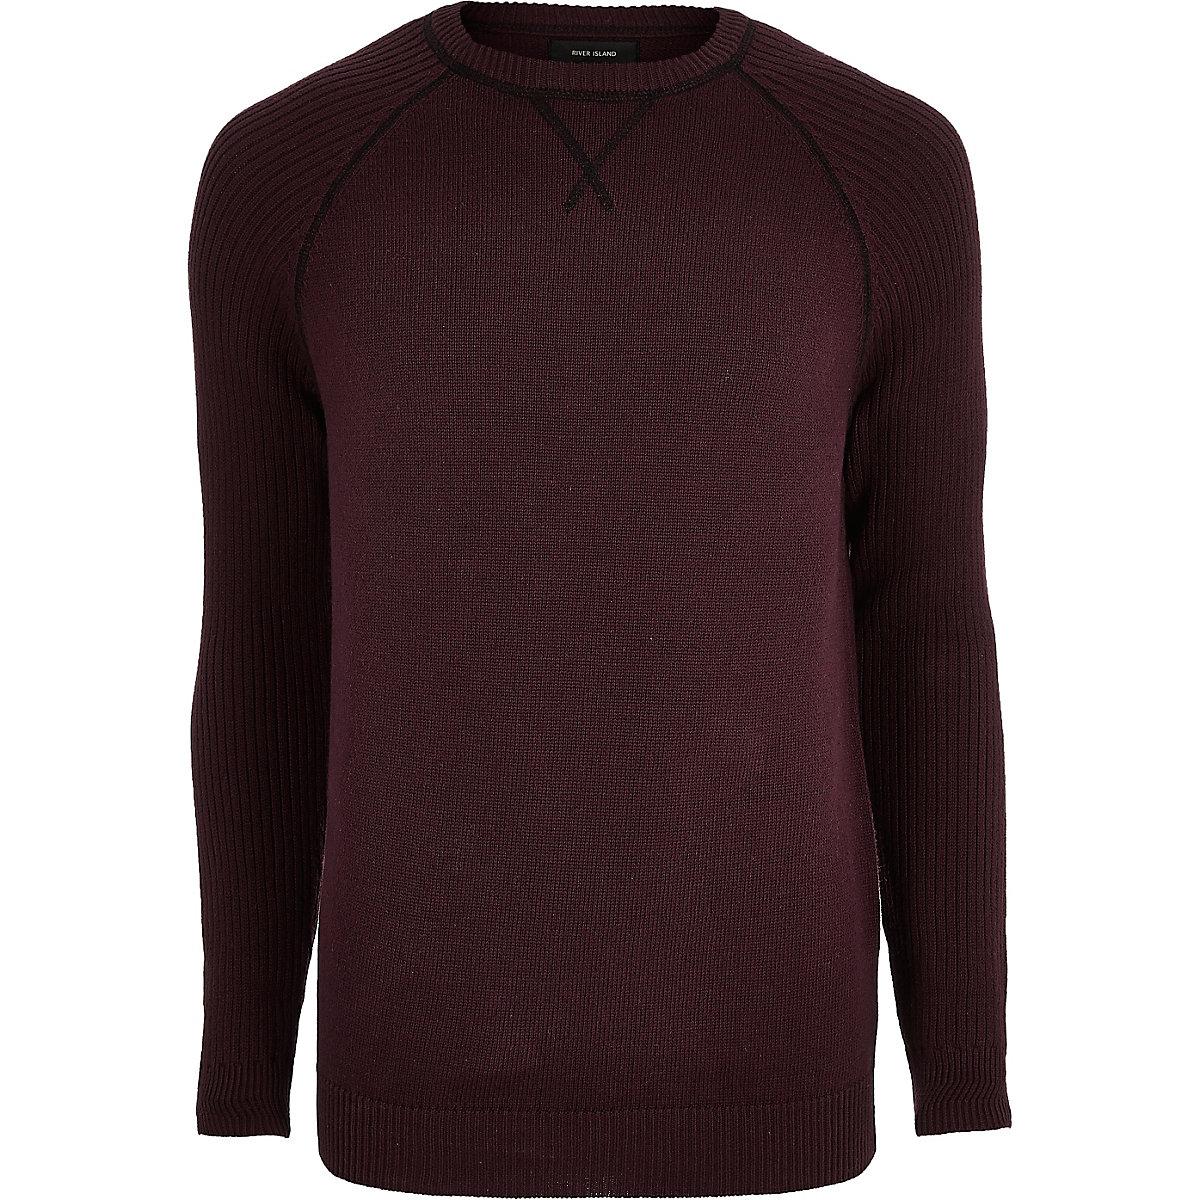 Burgundy knit raglan sleeve sweater